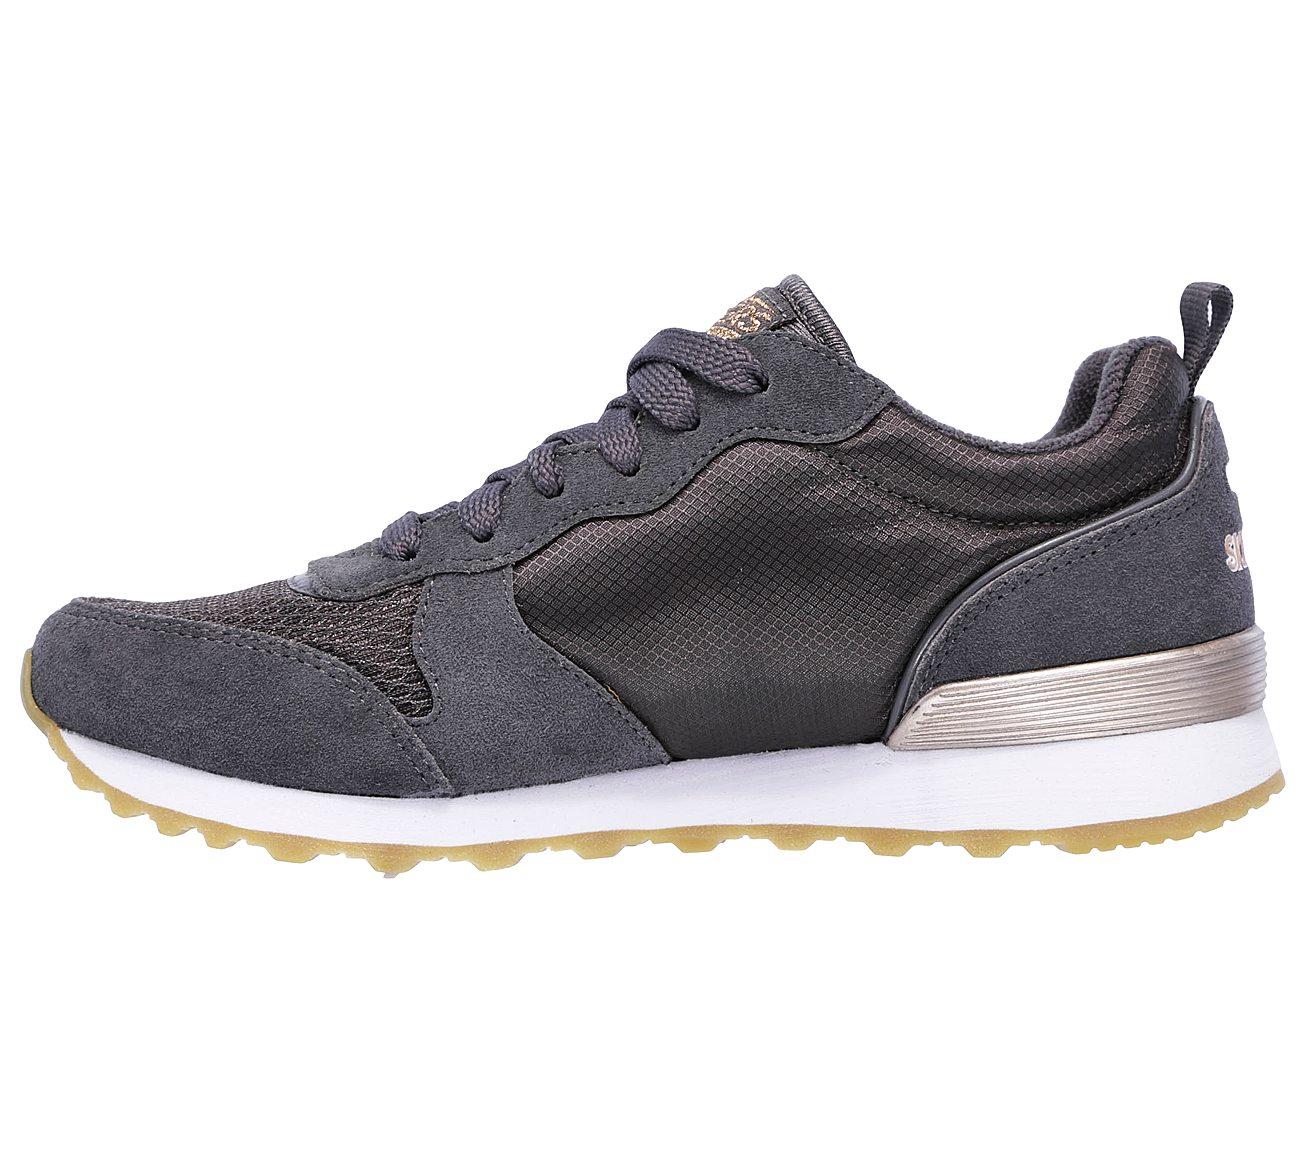 Cinco Cortés Leyes y regulaciones  Buy SKECHERS OG 85 - Goldn Gurl SKECHER Street Shoes